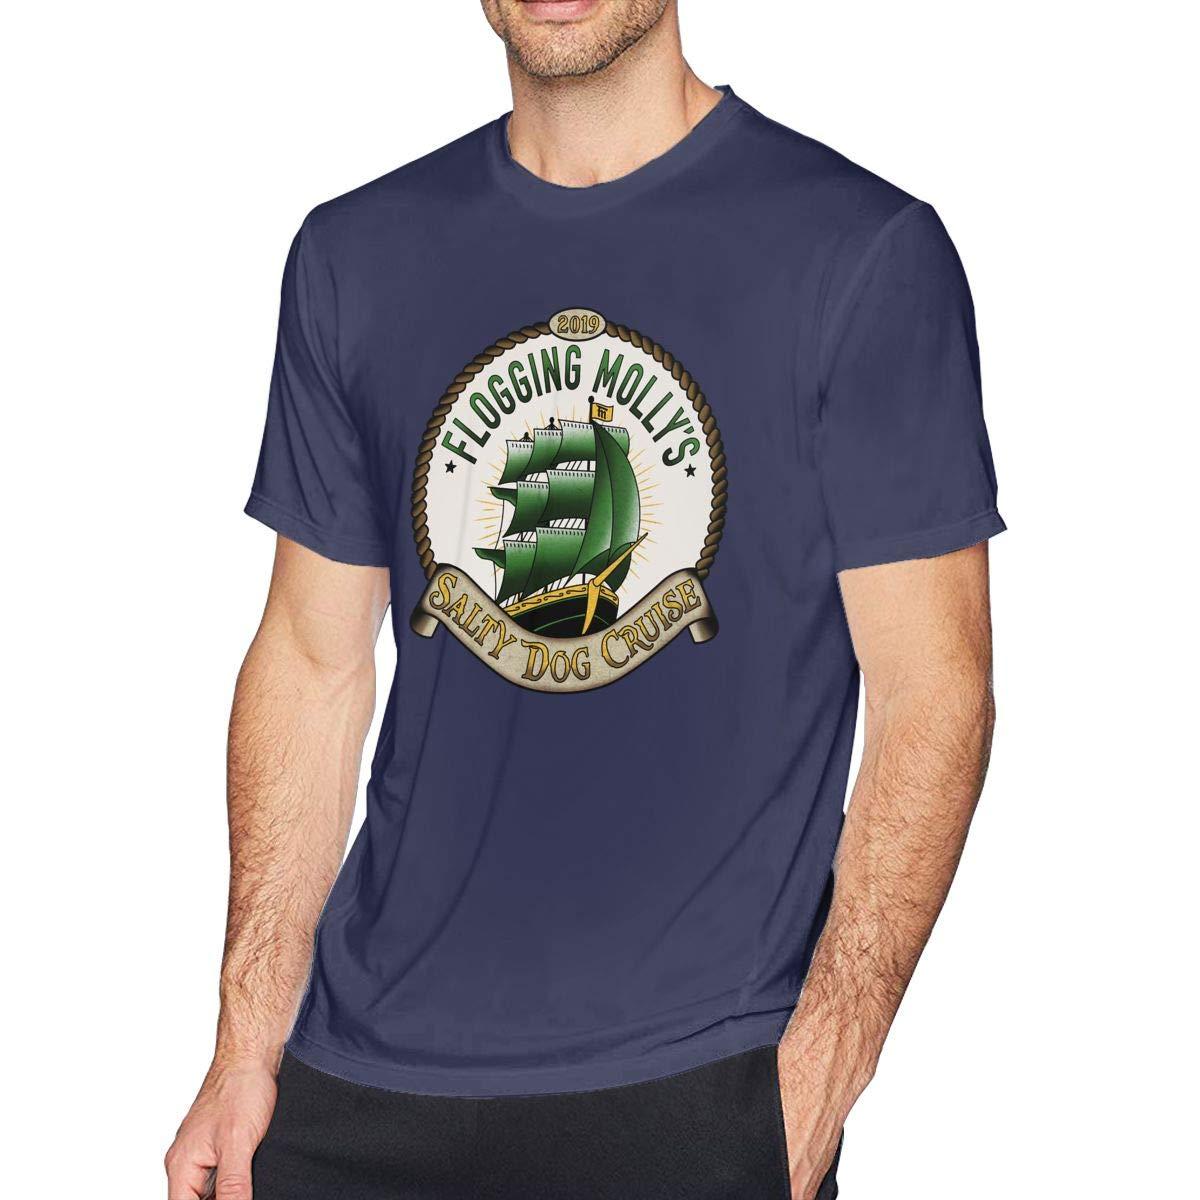 Fmtindall Flogging Molly Crewneck Ultra Short Sleeve Adult T Shirt 3603